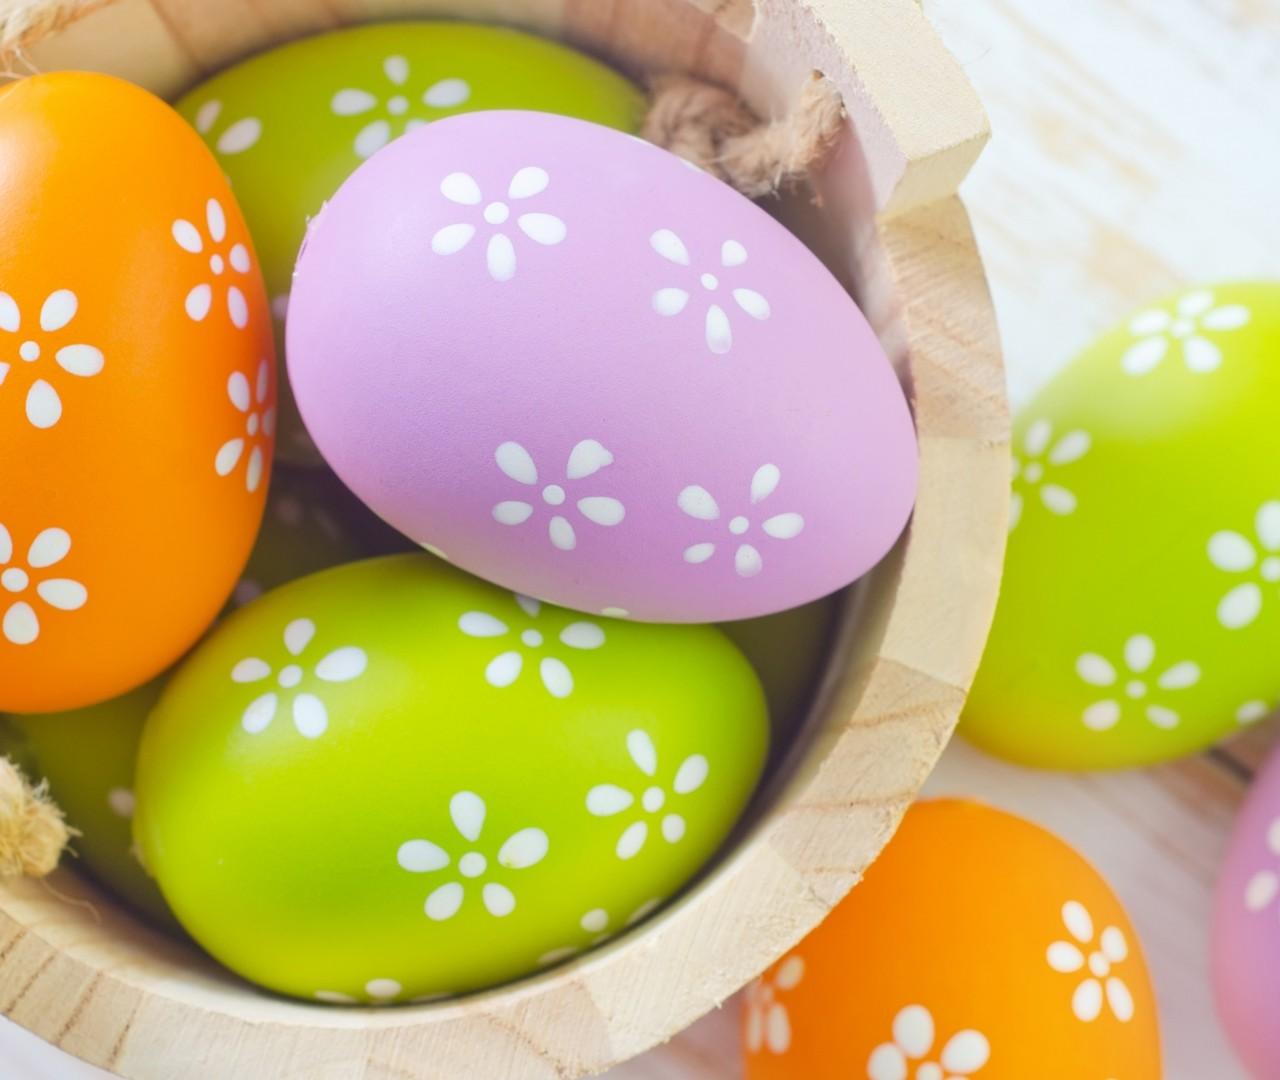 easter eggs HD Wallpaper 9504 1280x1080